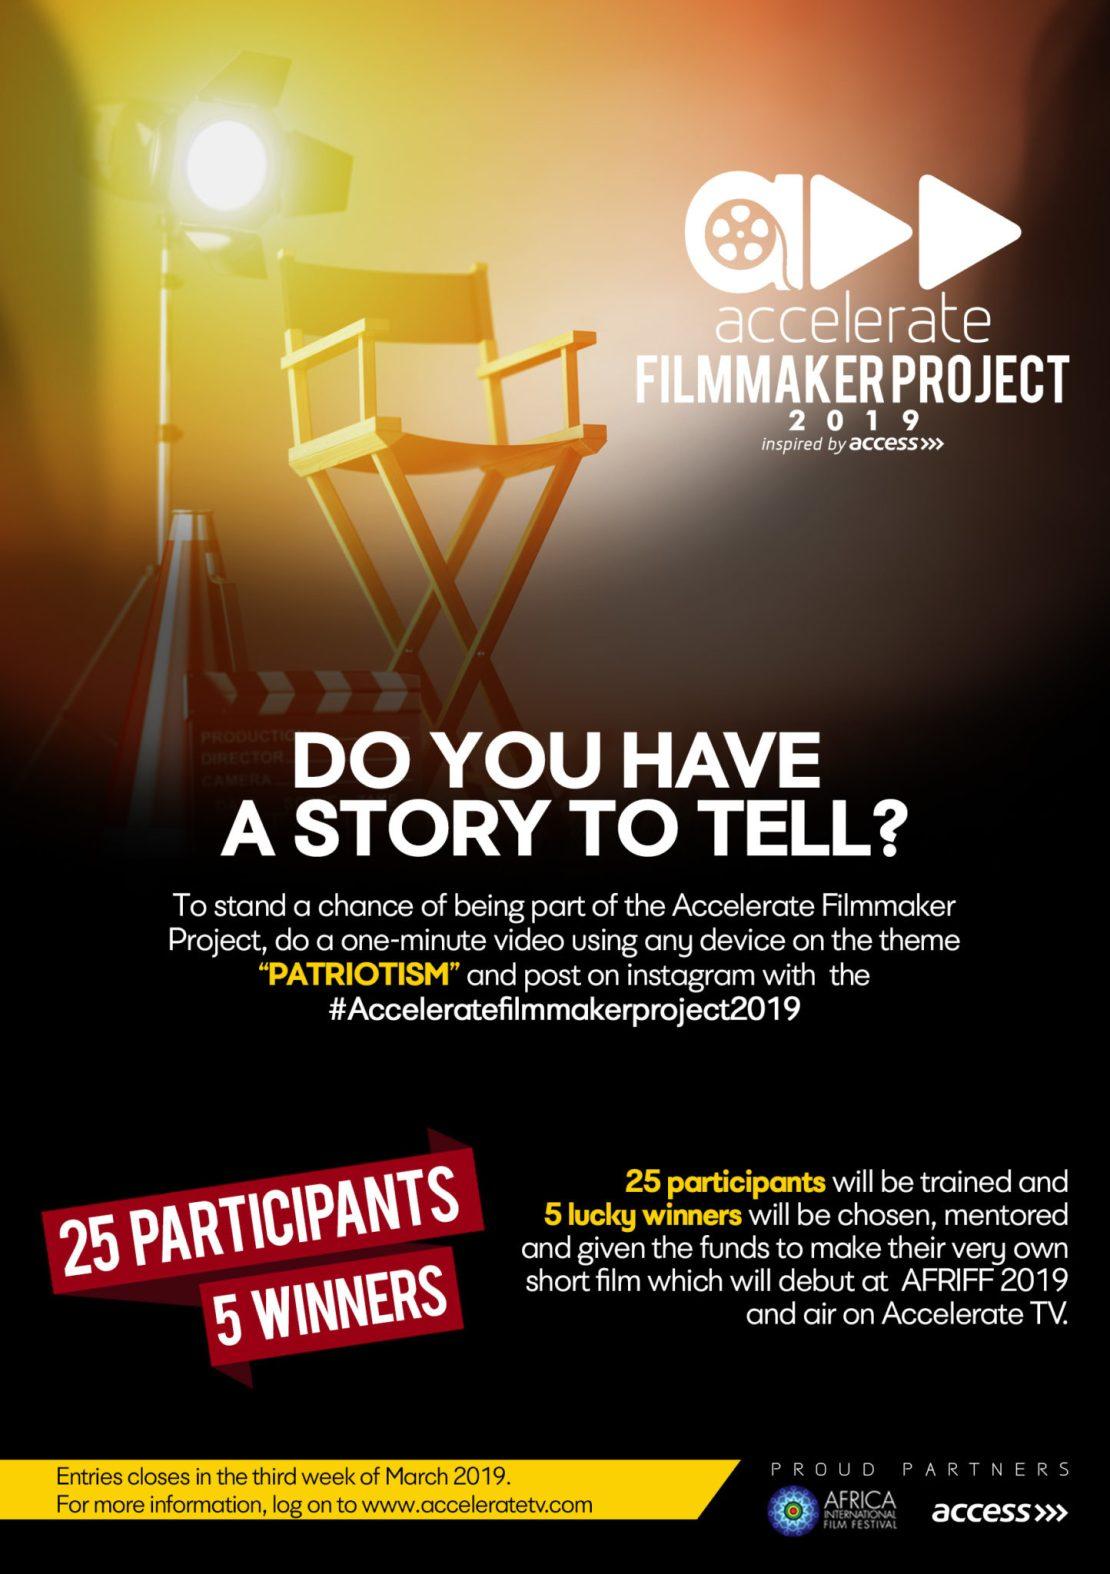 Accelerate Filmmaker Project